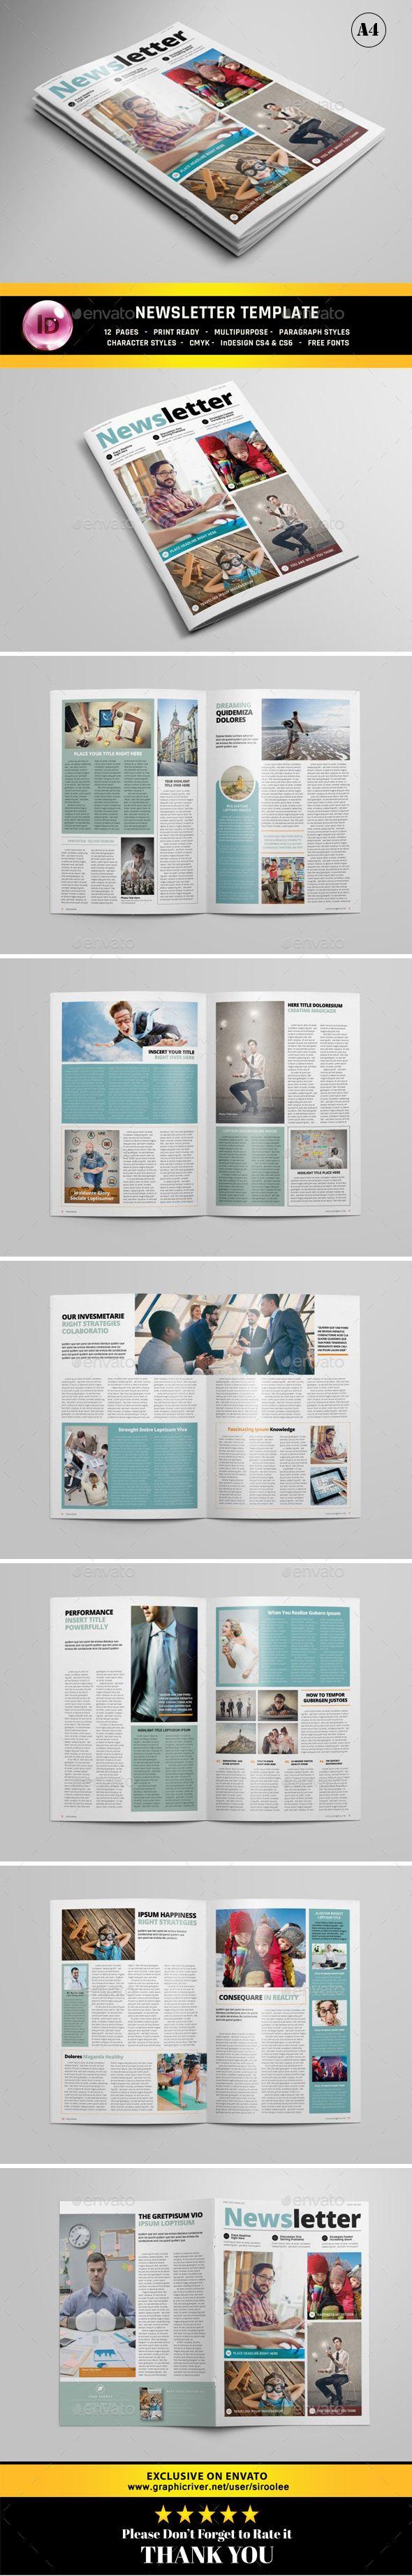 Multipurpose Newsletter | Revistas, Asas y Diario